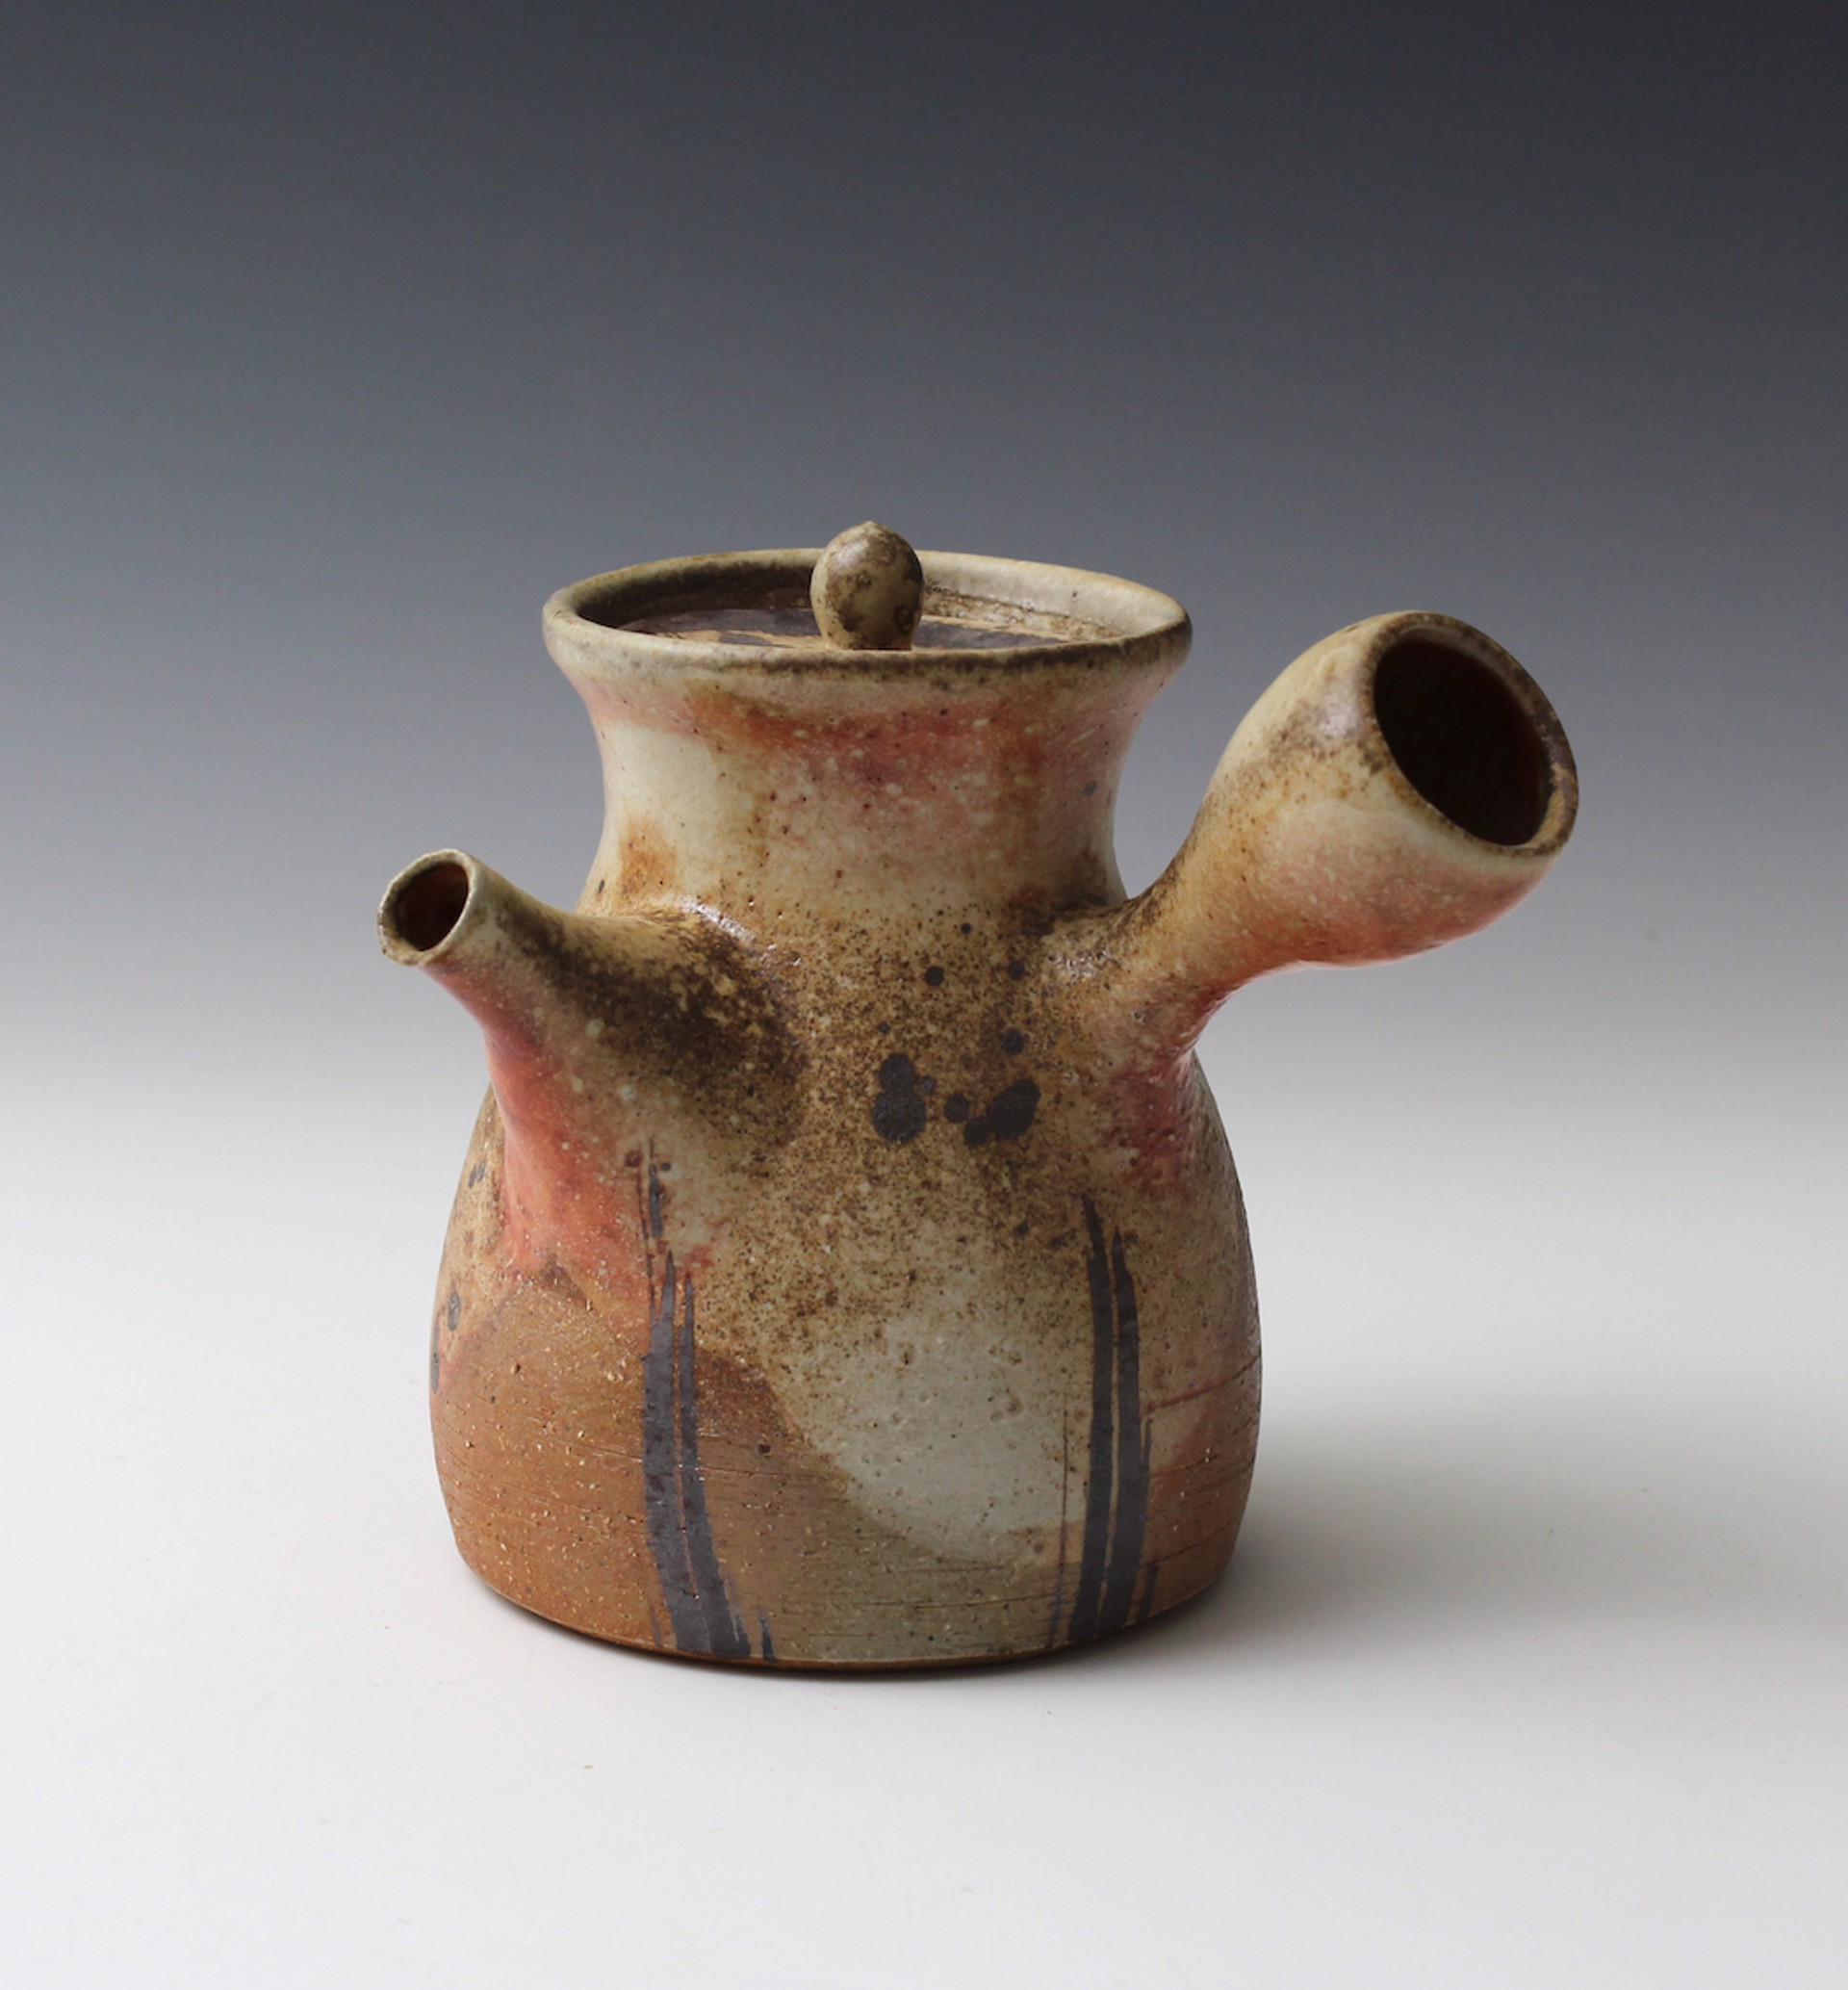 Wood Fired Teapot by Hitomi Shibata